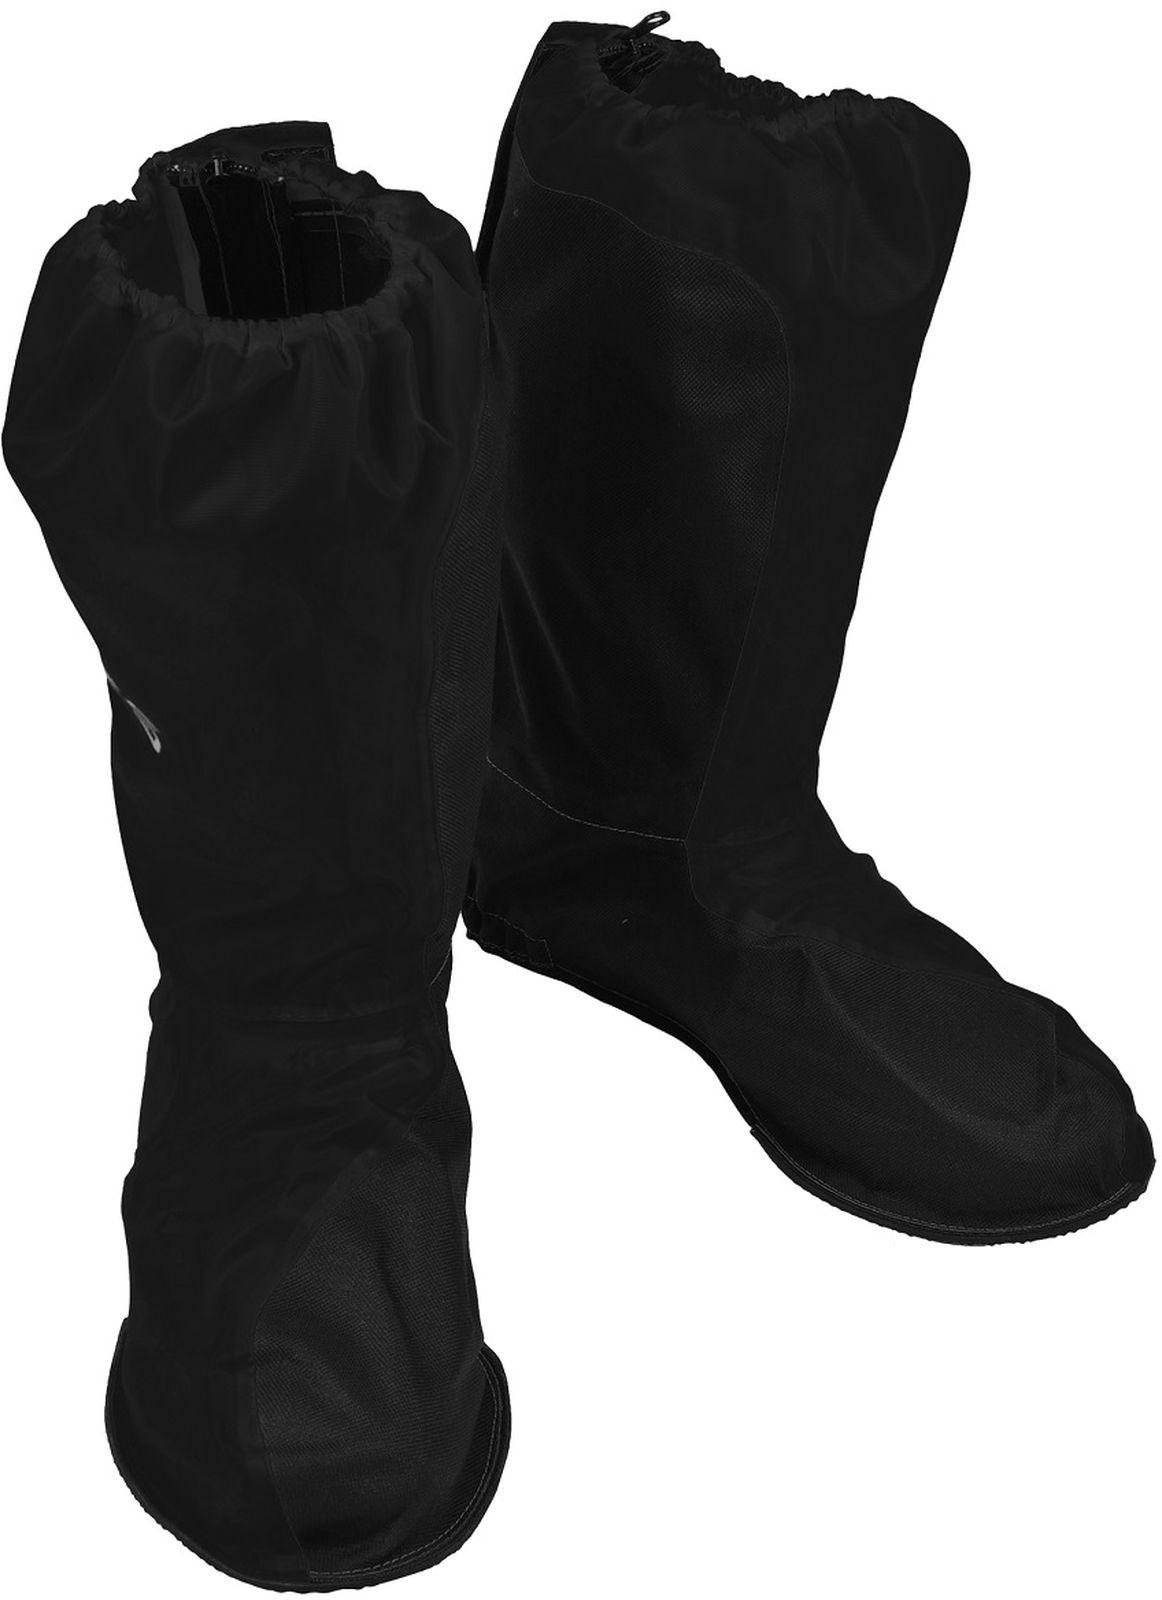 Мотодождевик Starks Rain Boots, LC0054, черный, размер S